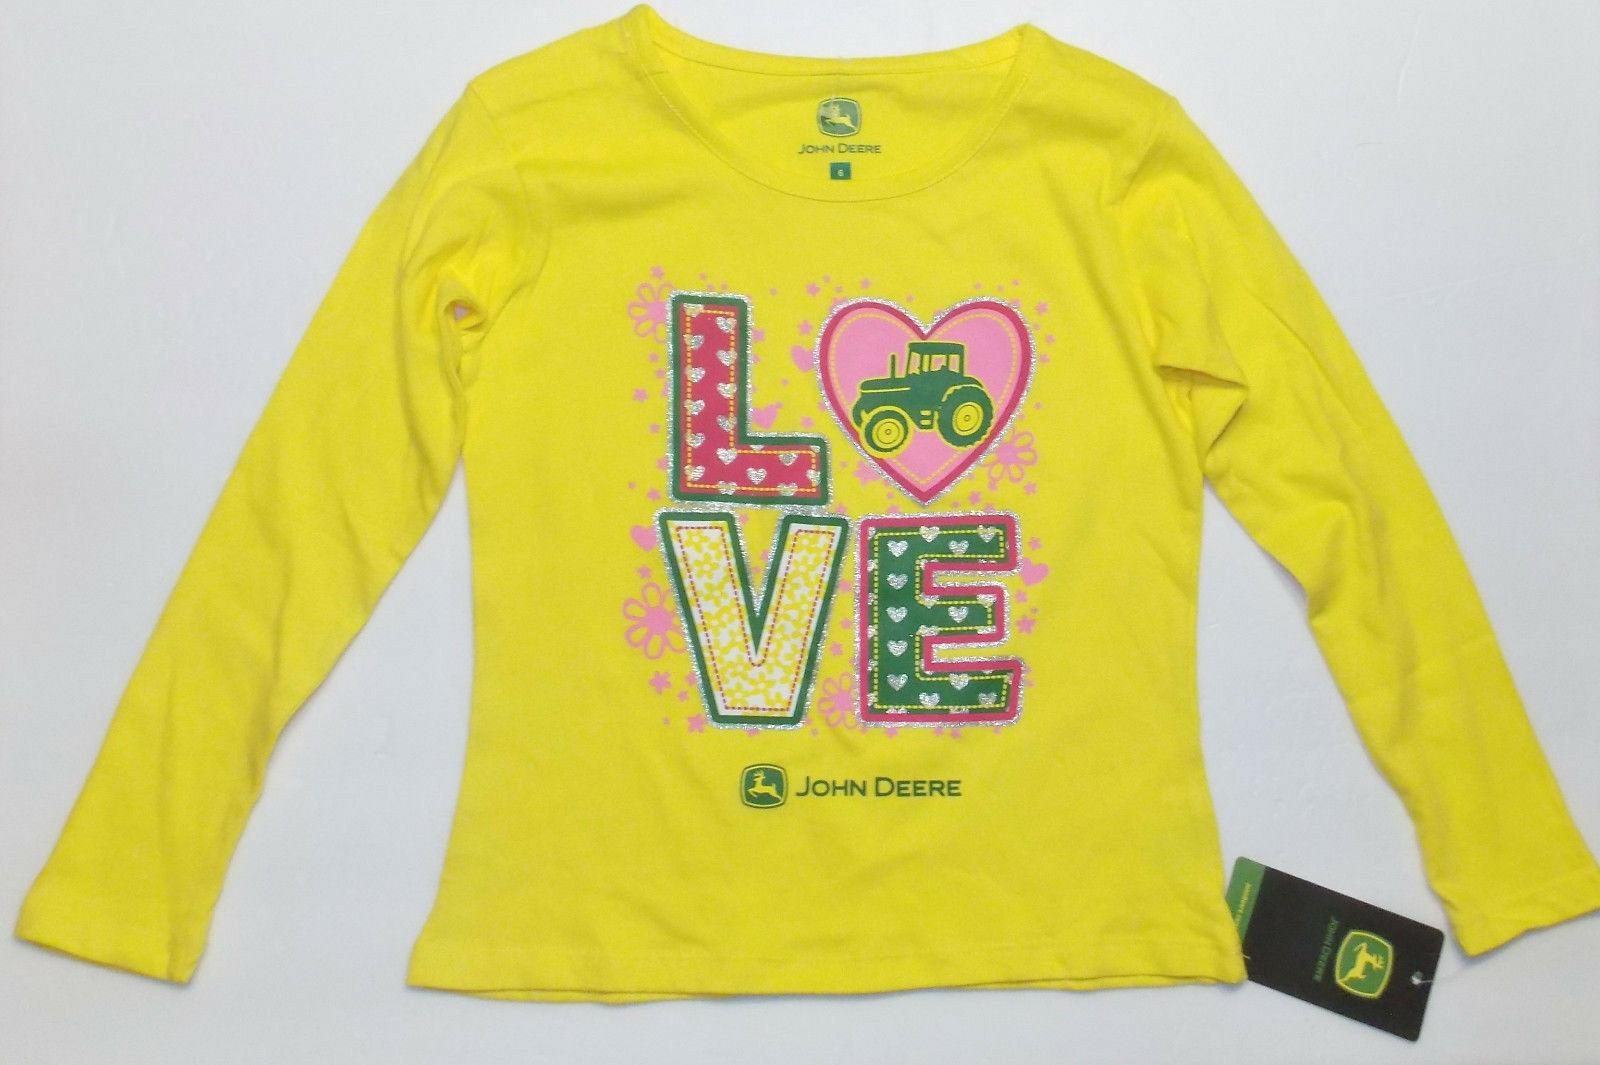 John Deere Girls Long Sleeve Yellow Love Shirt Sizes 4, 5 and 6 NWT